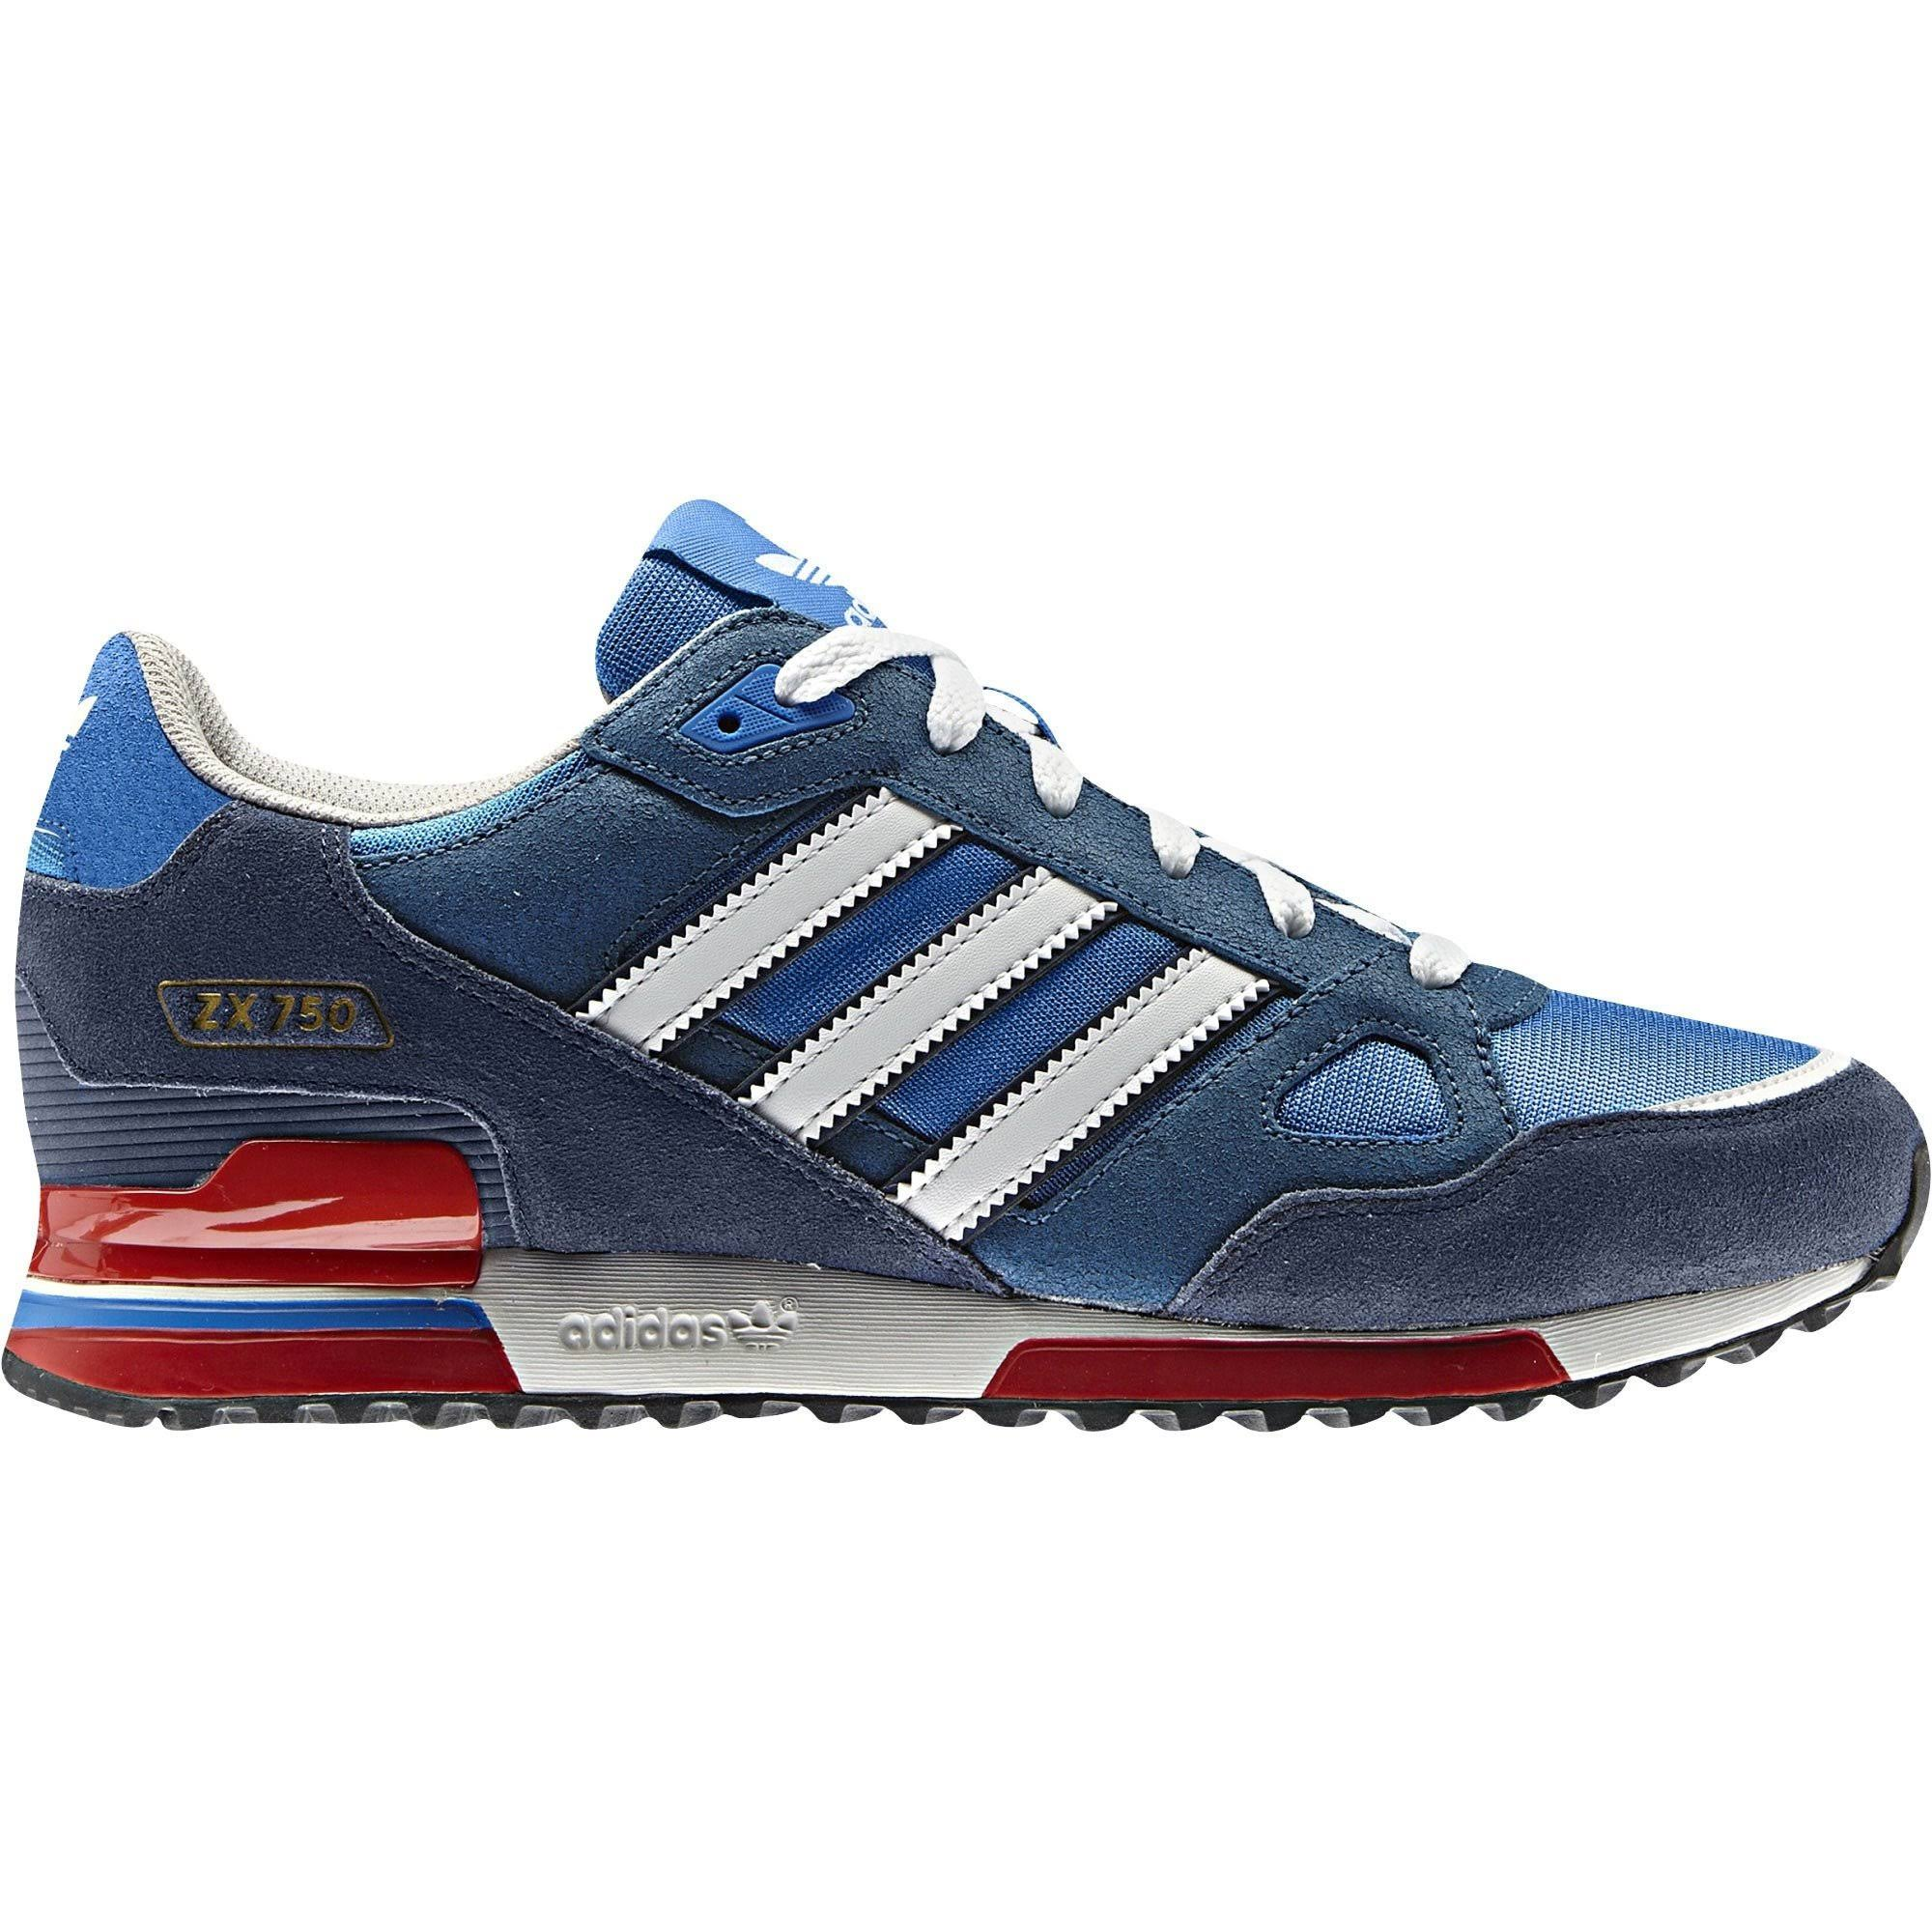 (9) Adidas Originals ZX 750 - Blue